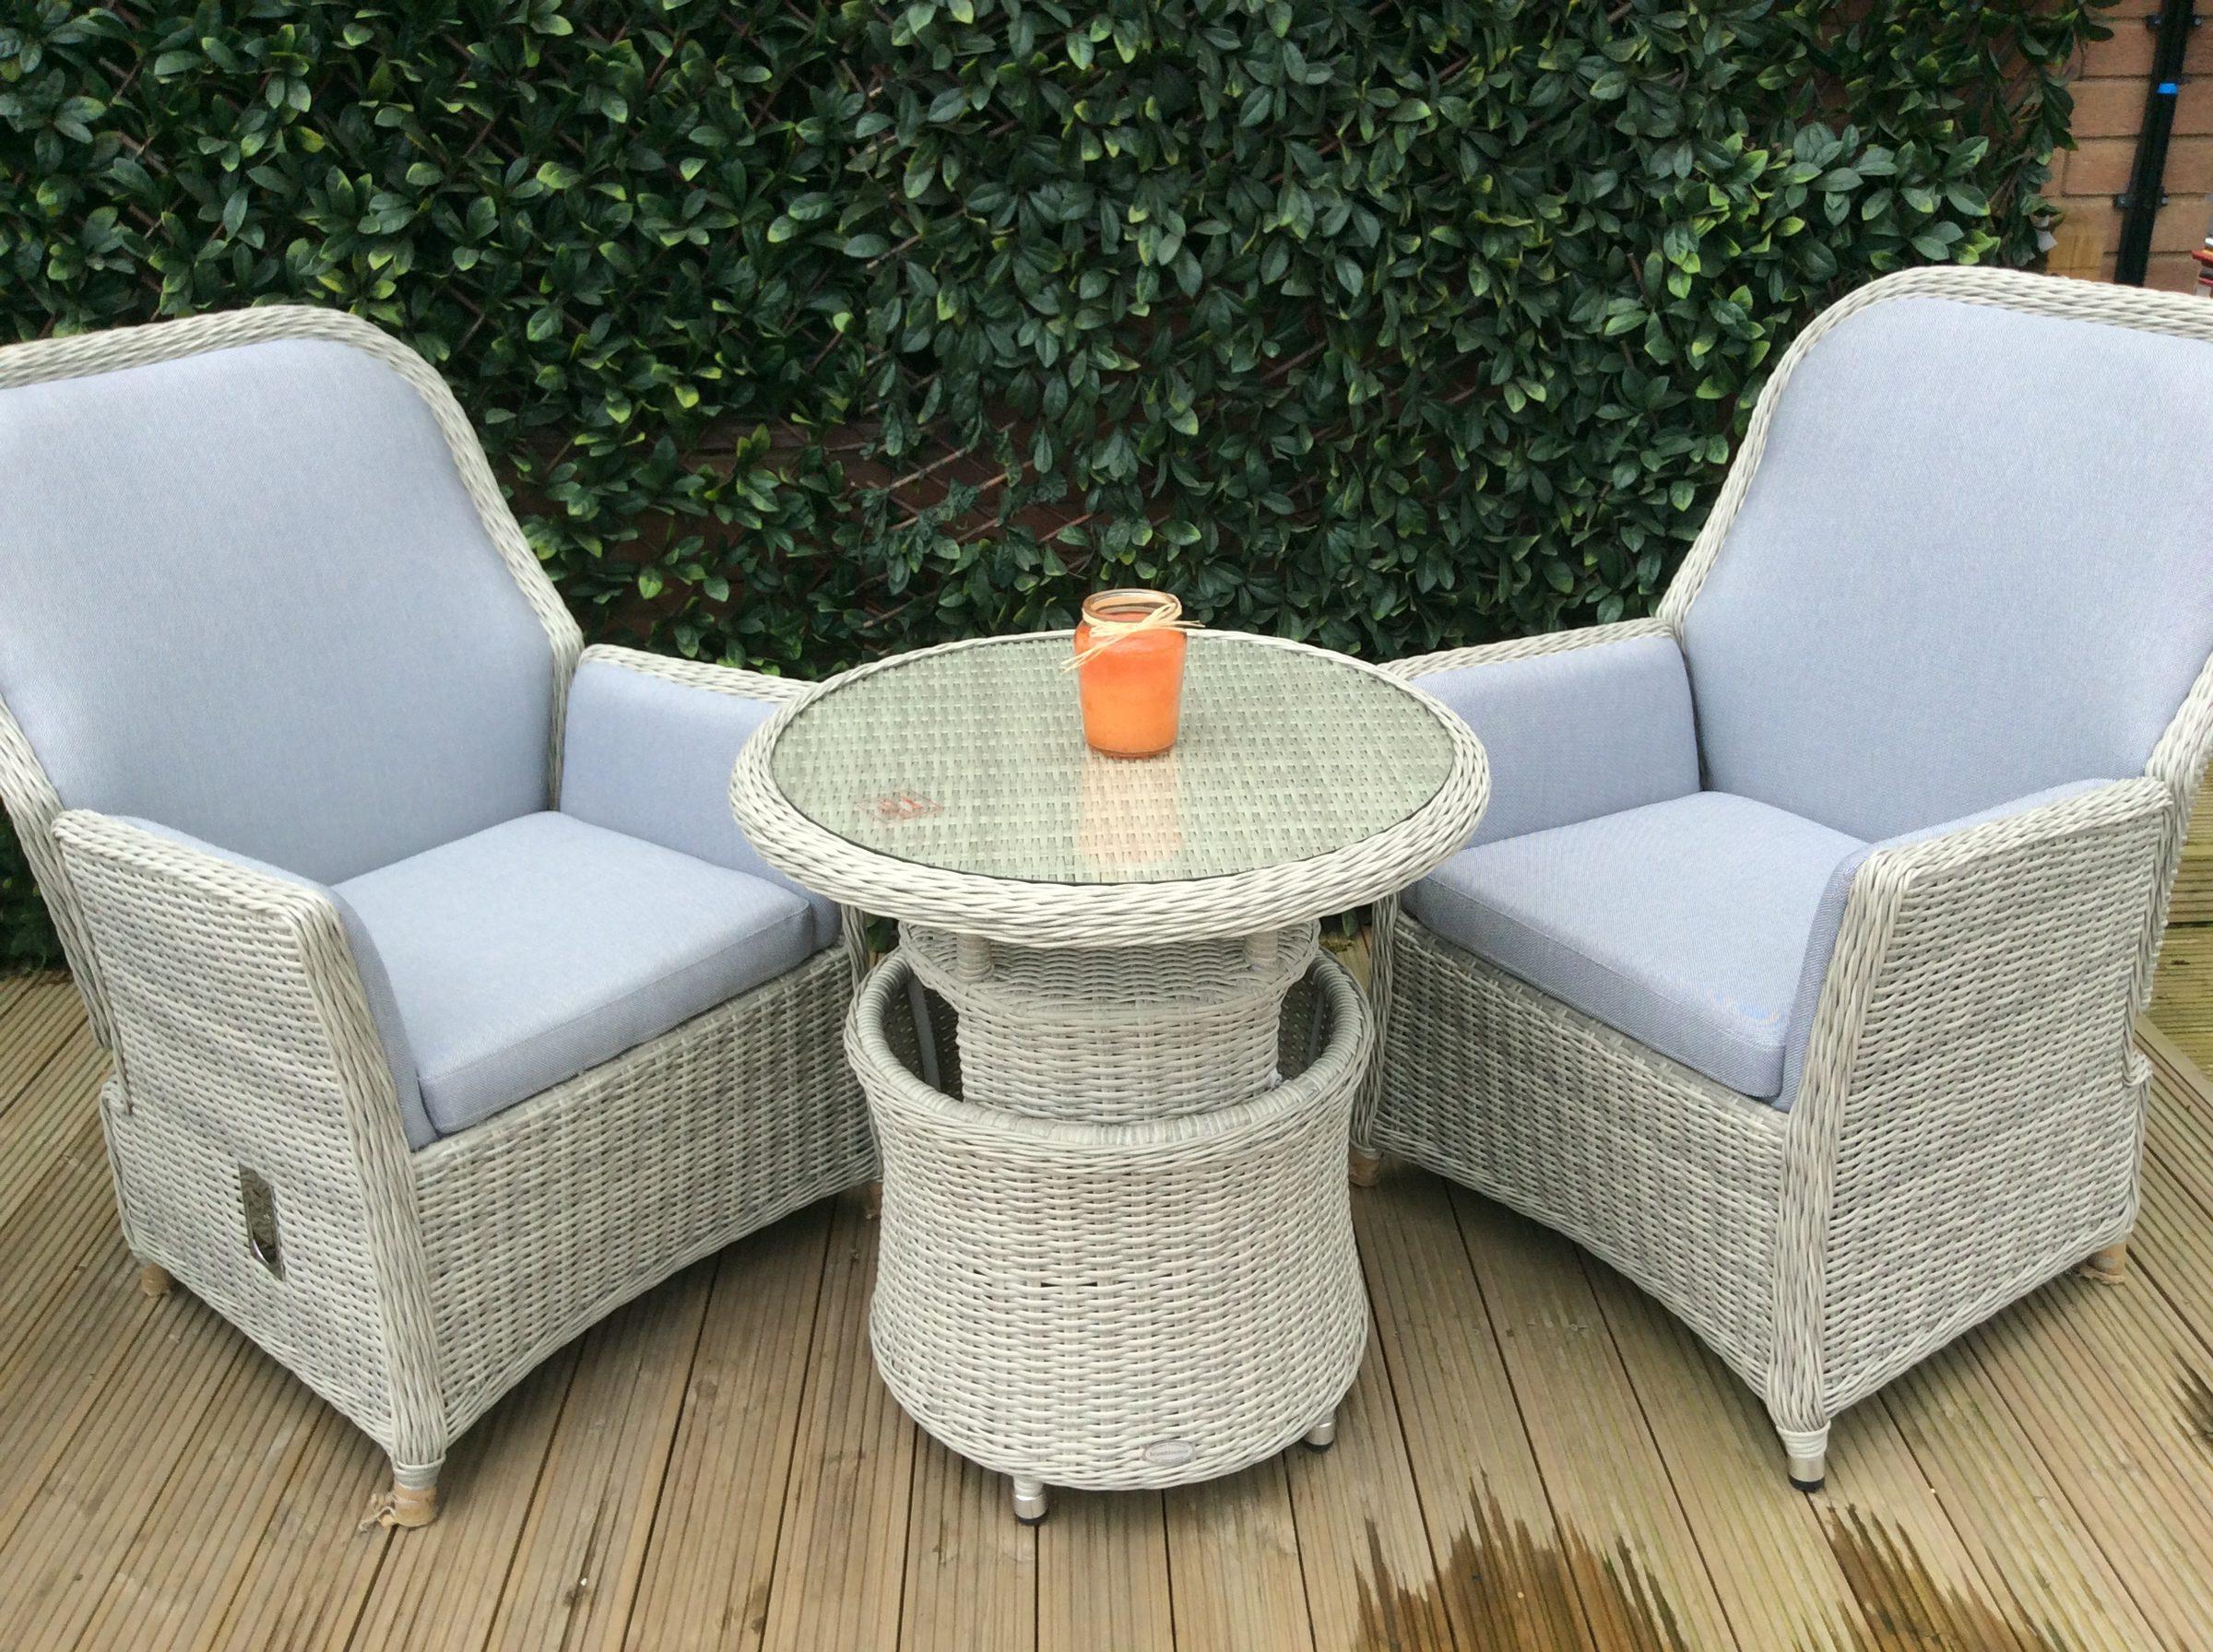 Bramblecrest Gainsborough Bistro Set with Adjustable Table 2018